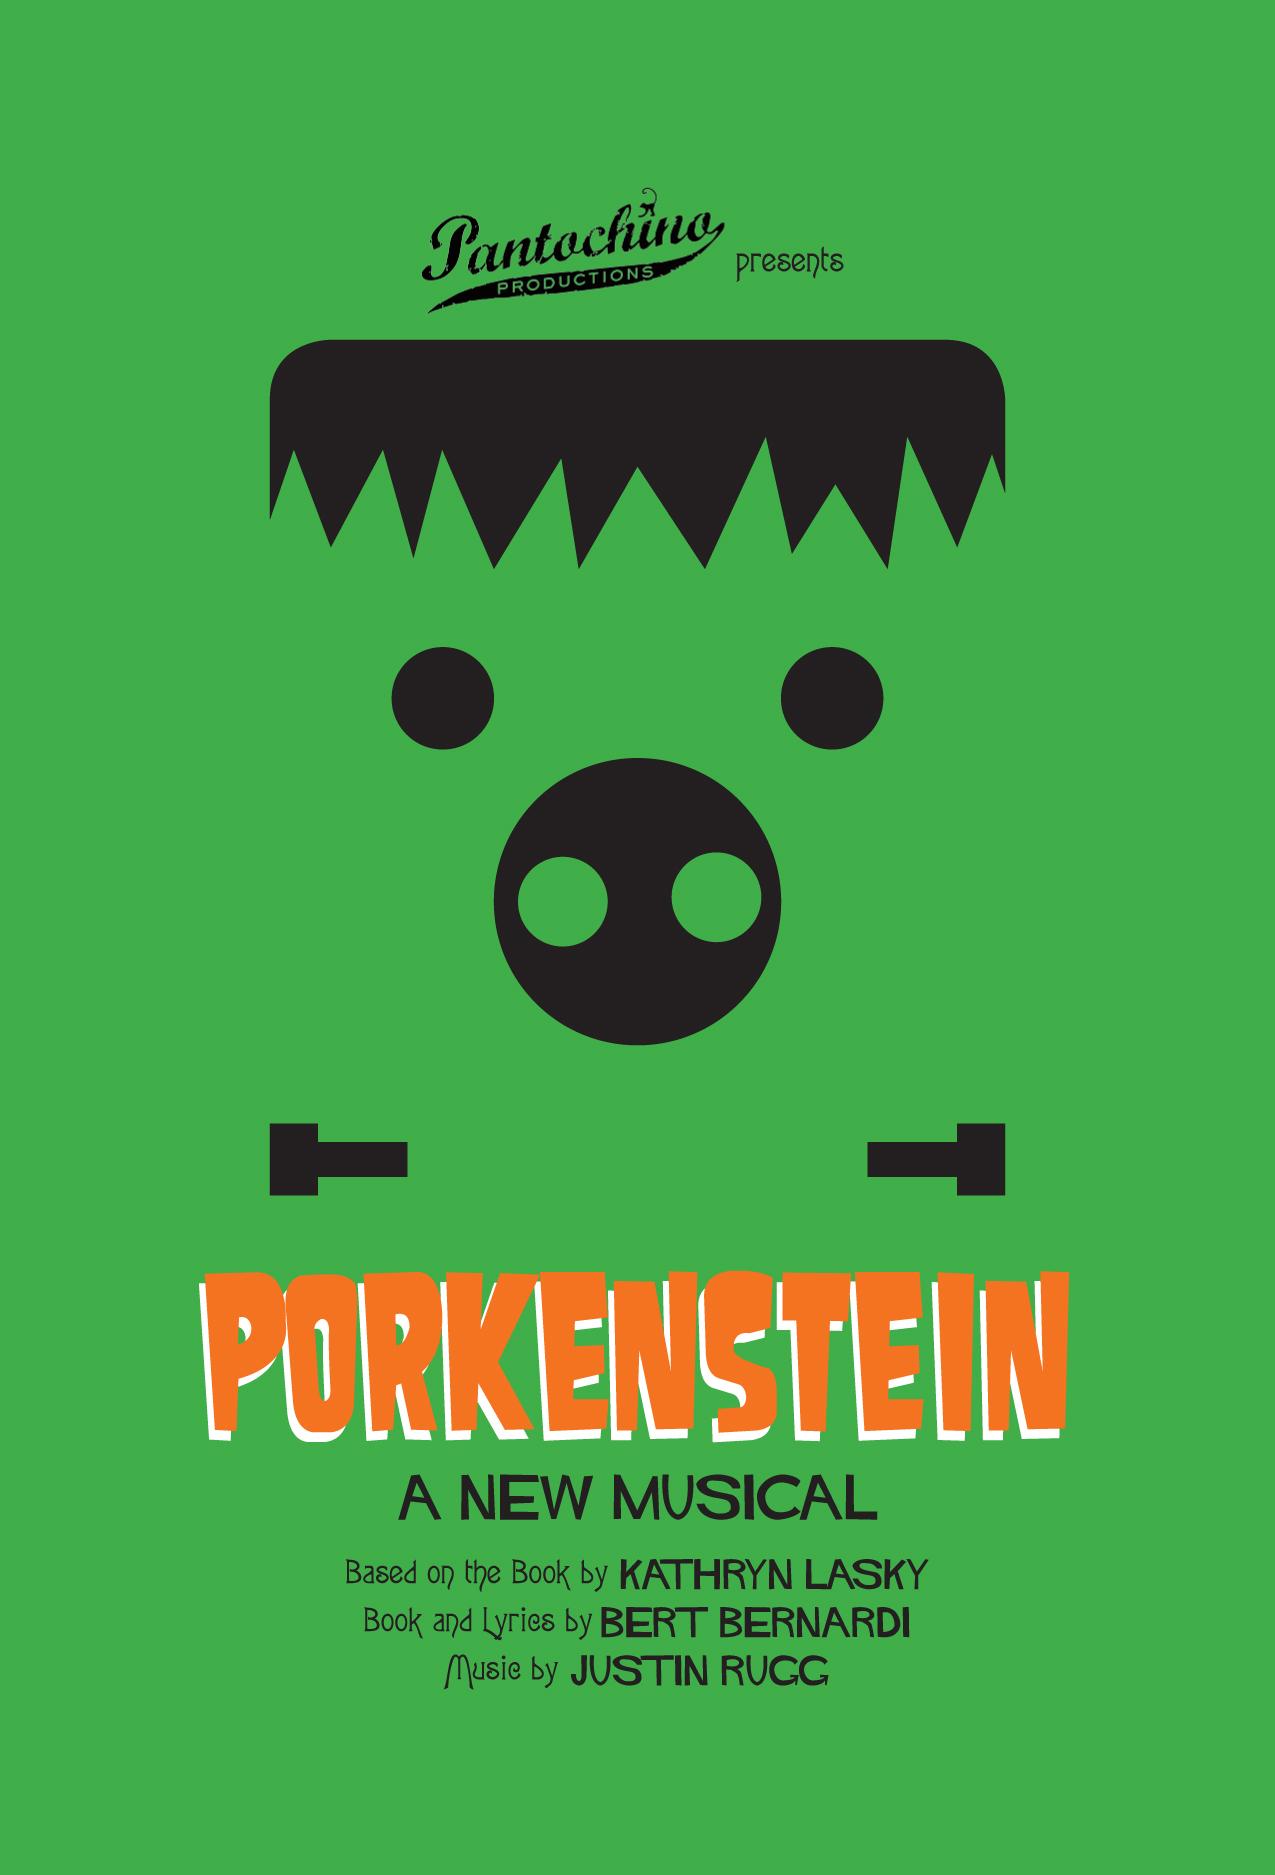 PorkPostcardAFront.jpg